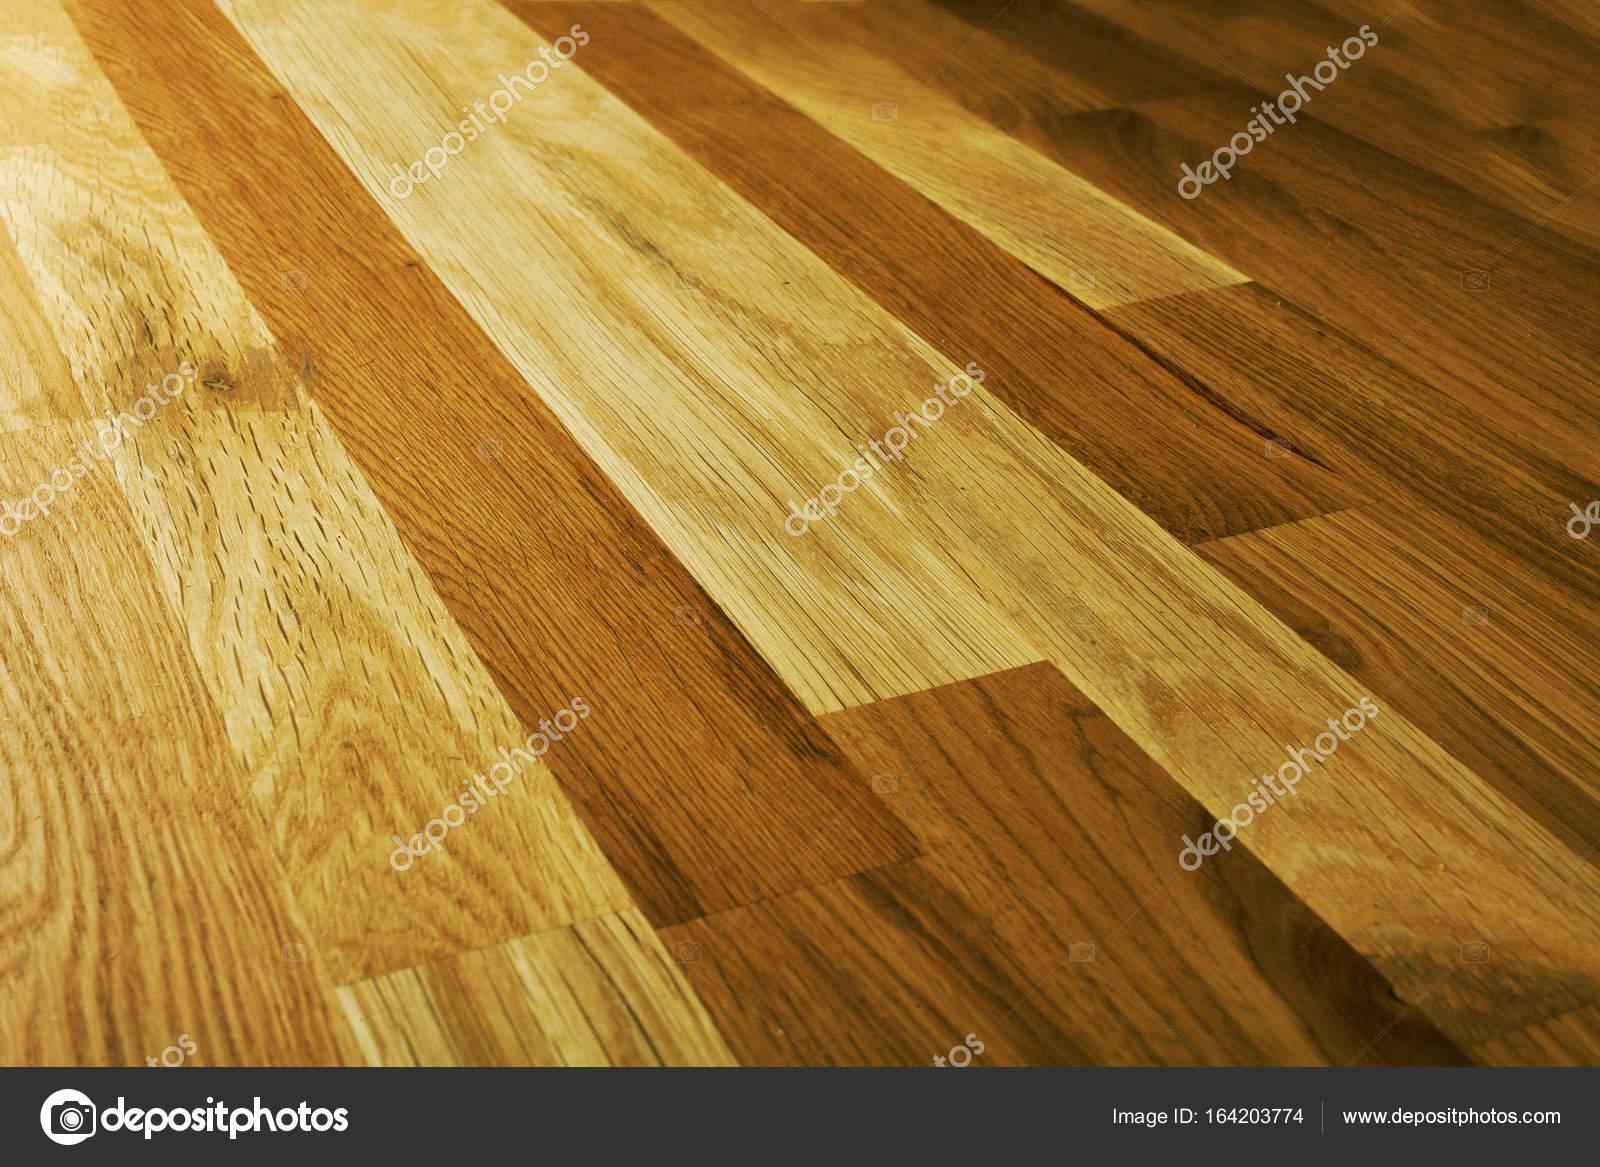 Asombroso color madera roble cresta ideas de decoraci n - Color madera roble ...